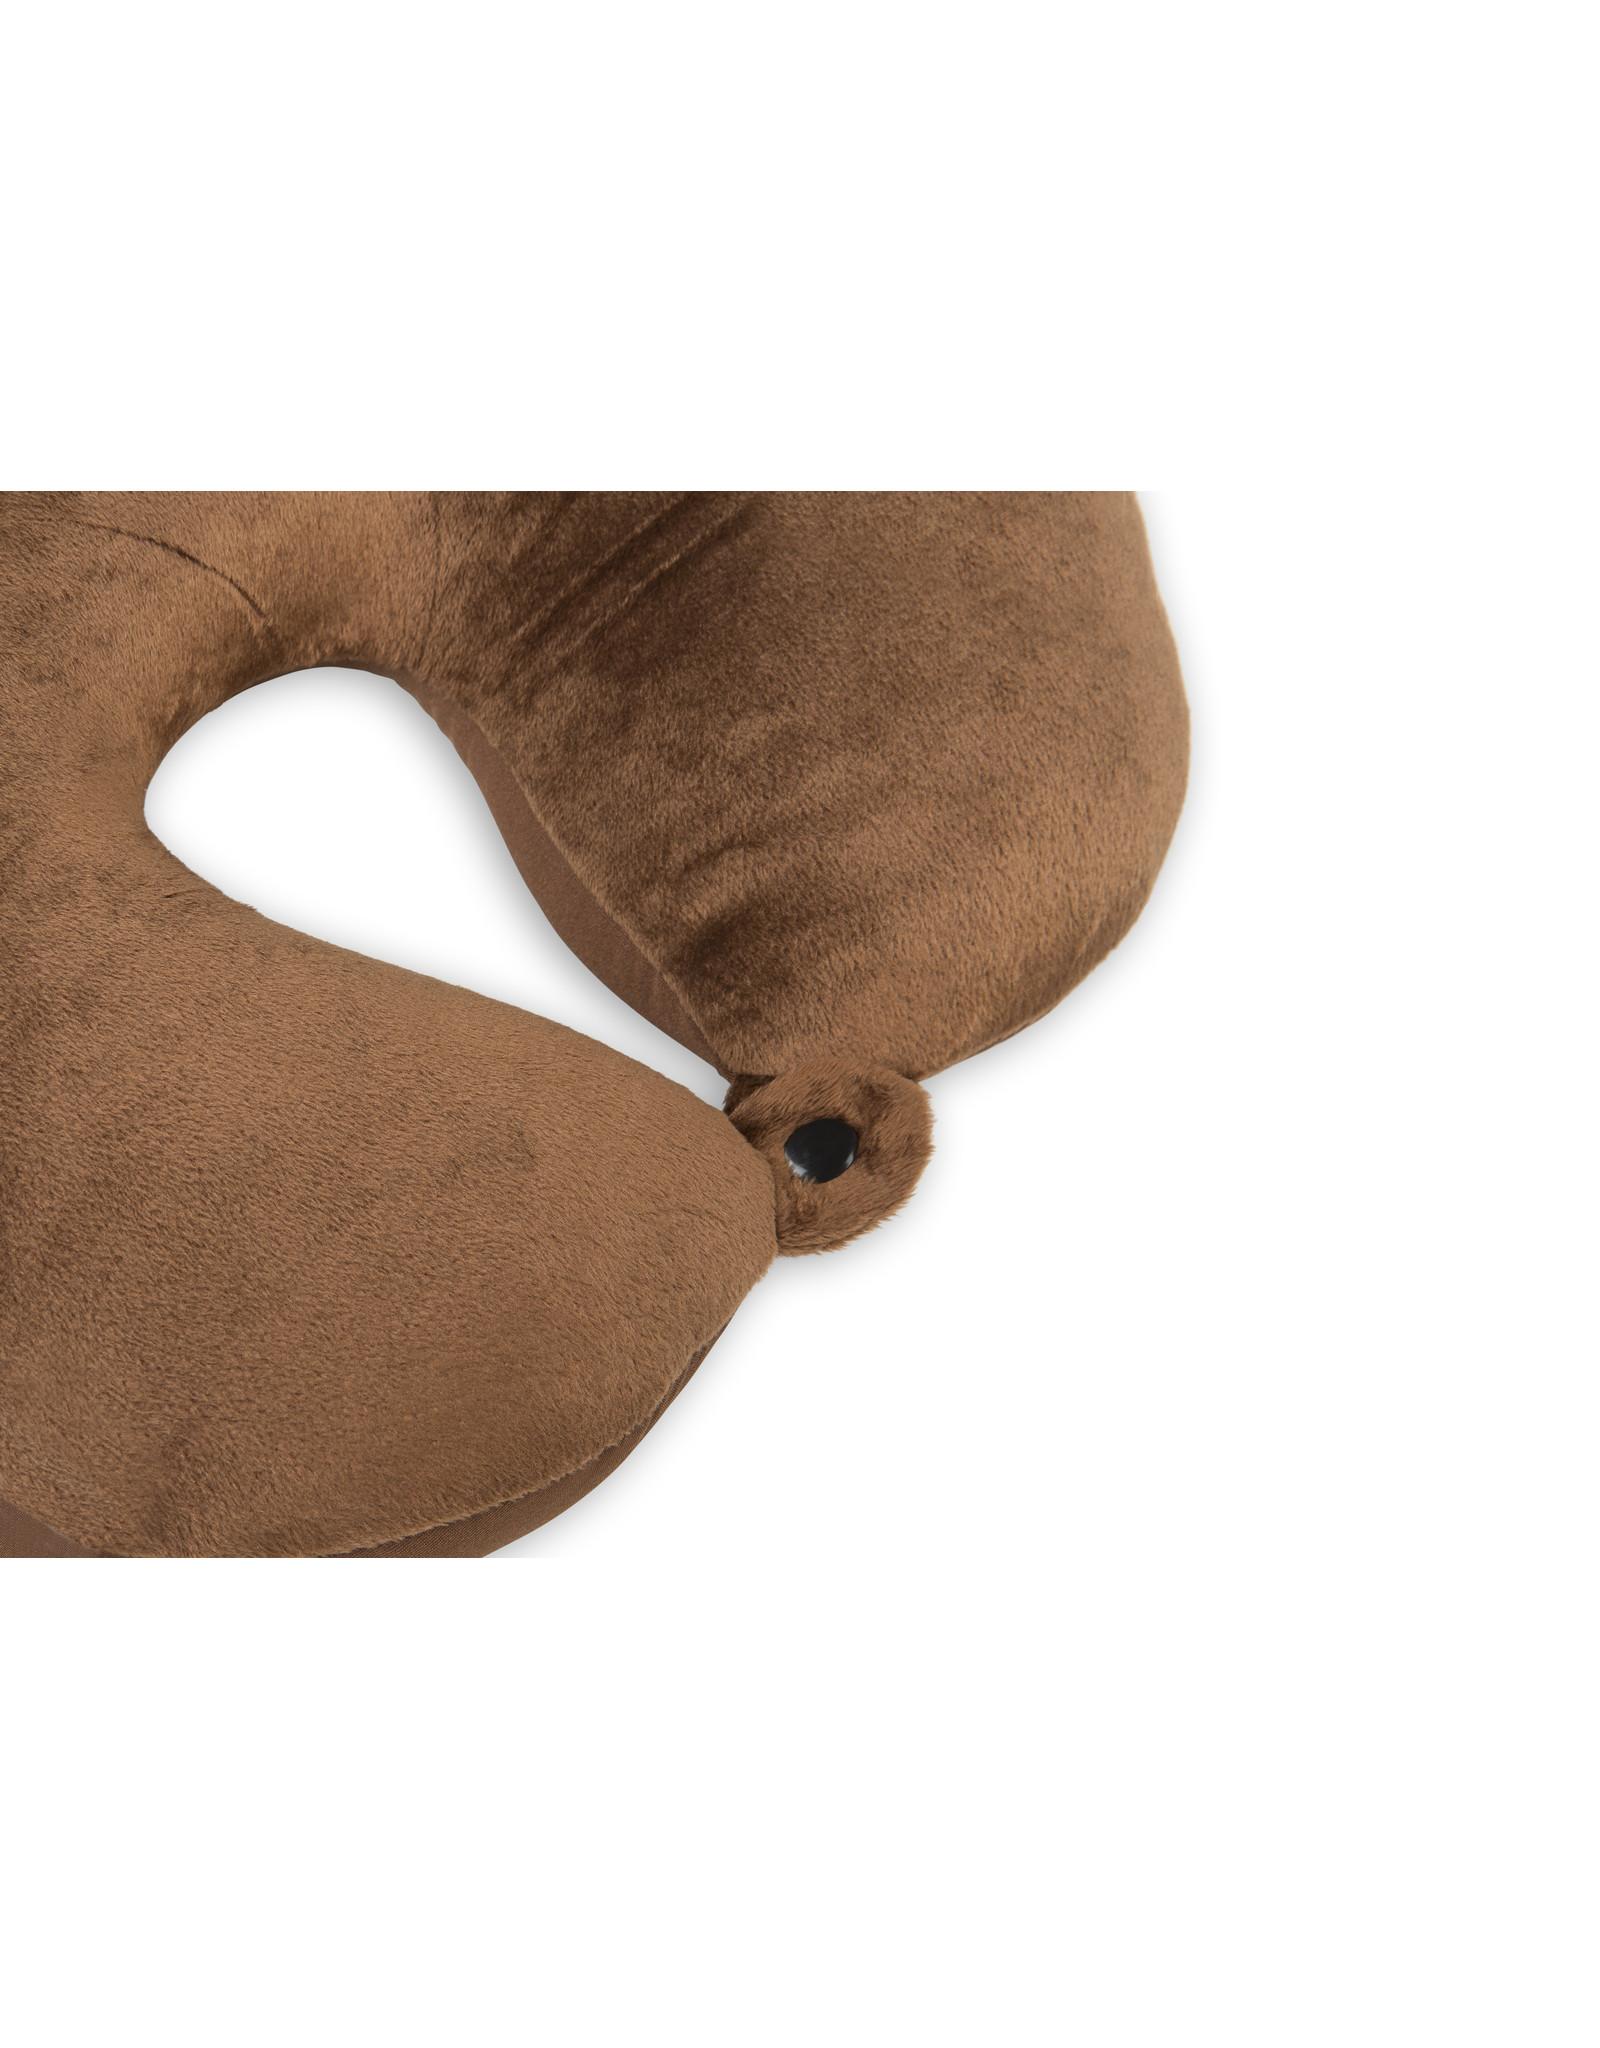 Kuschel-Maxx Kuschel-Maxx - Nack cushion Brown